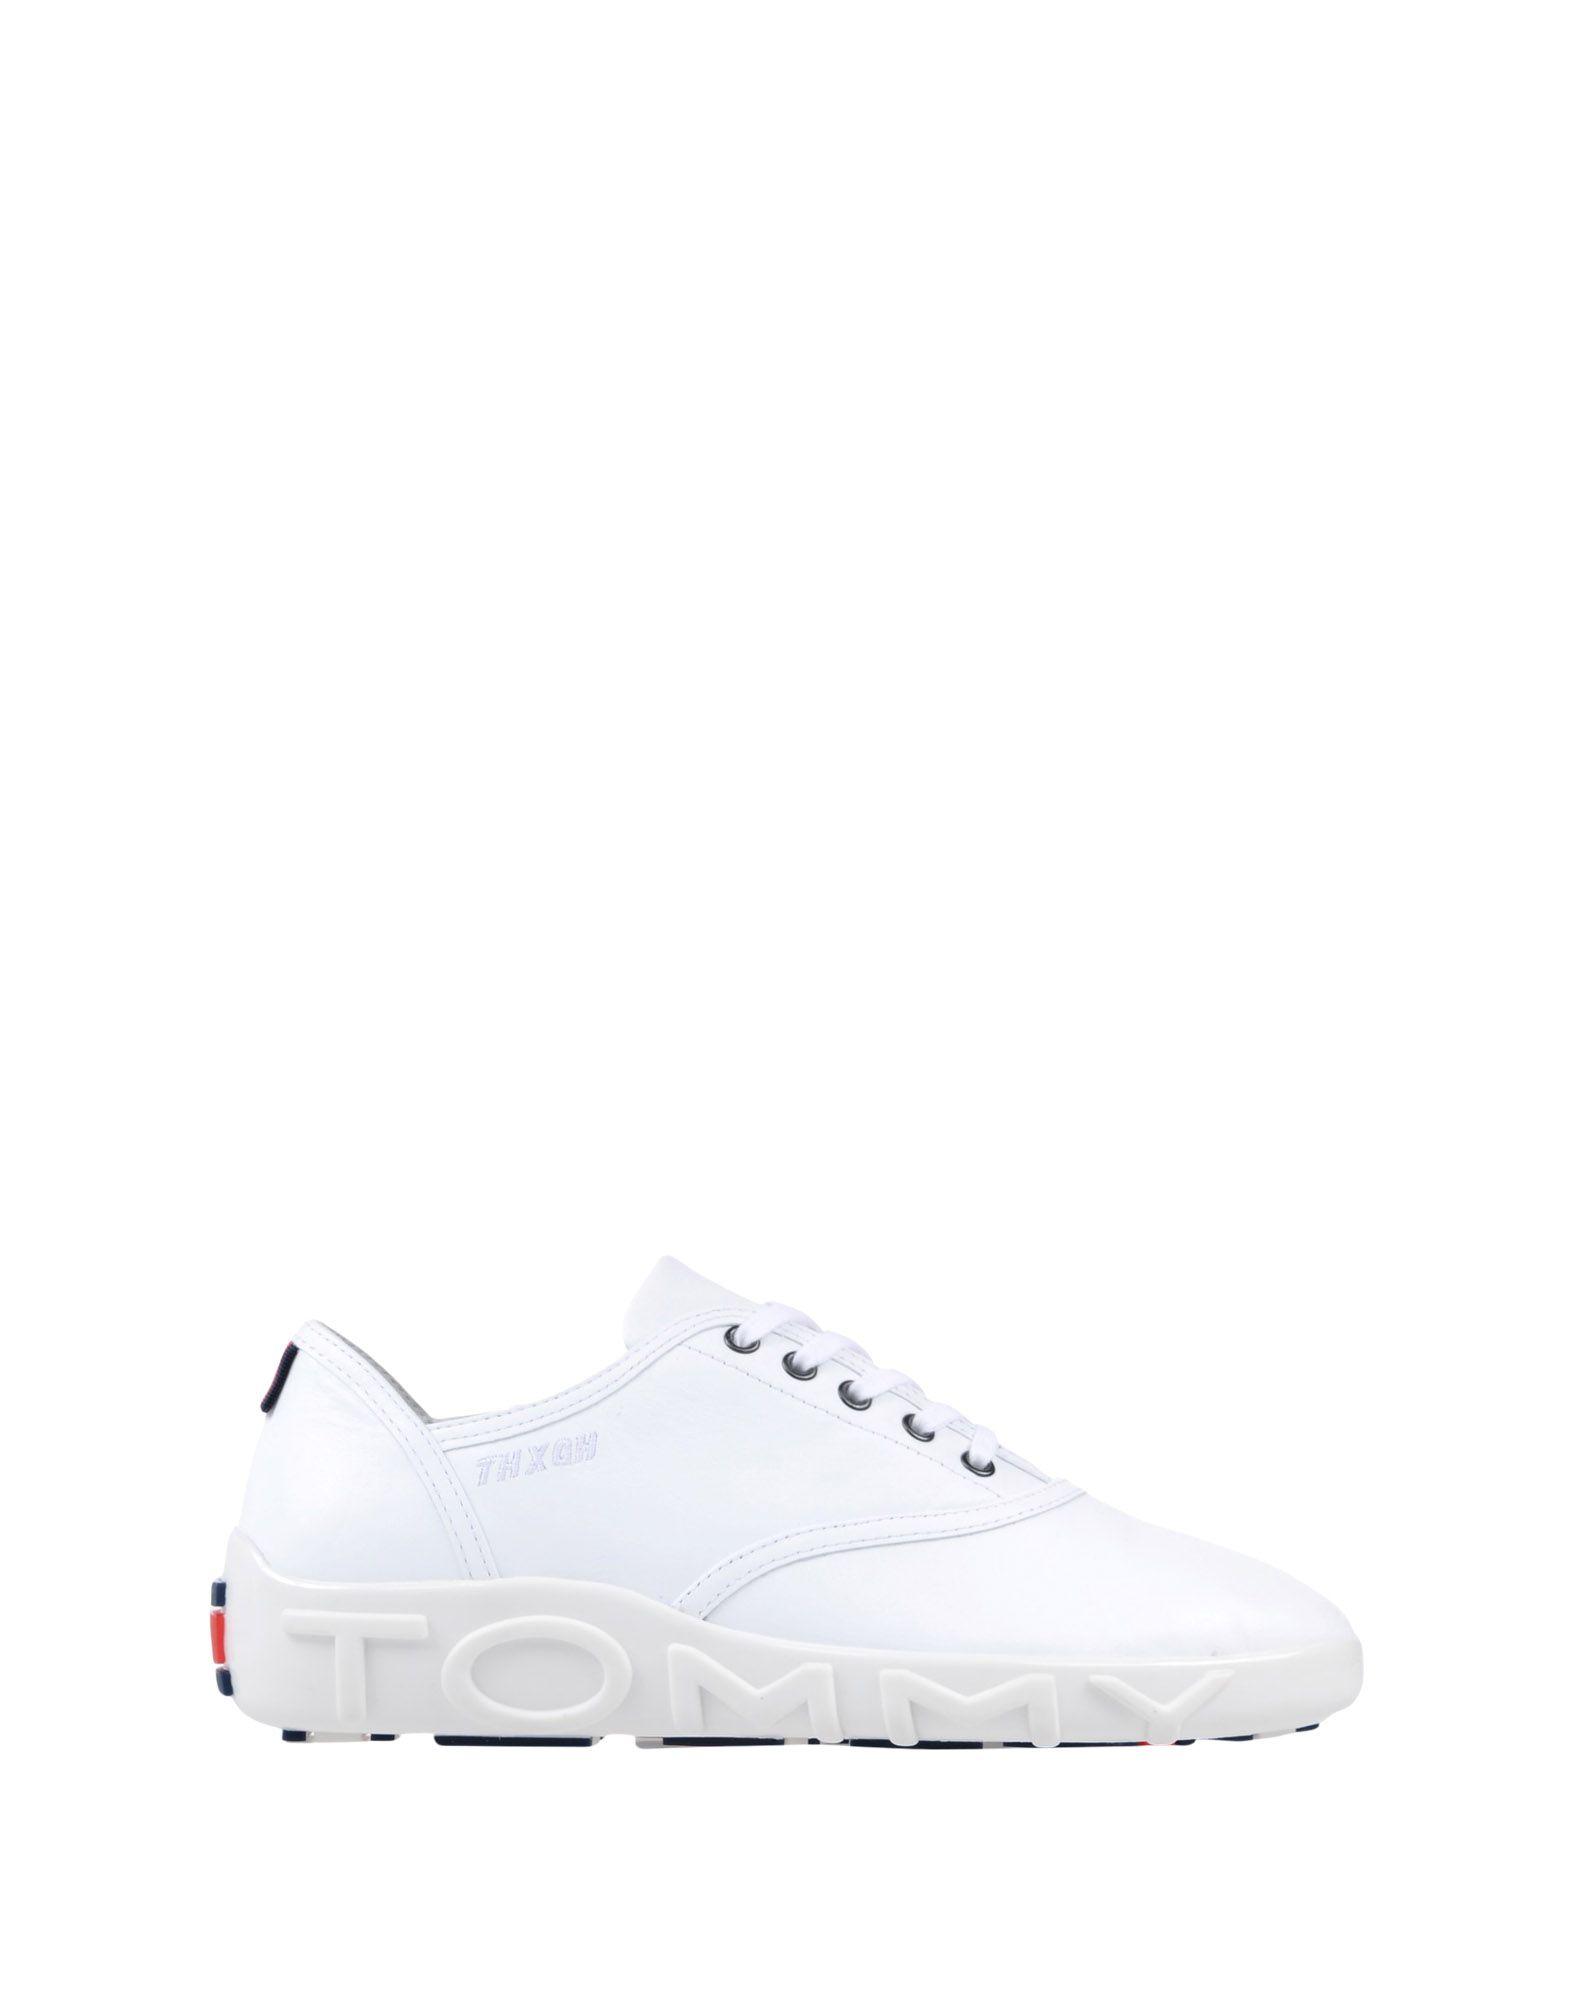 Sneakers Gigi Hadid X Tommy Hilfiger Gigi Hadid Sneaker - Femme - Sneakers Gigi Hadid X Tommy Hilfiger sur